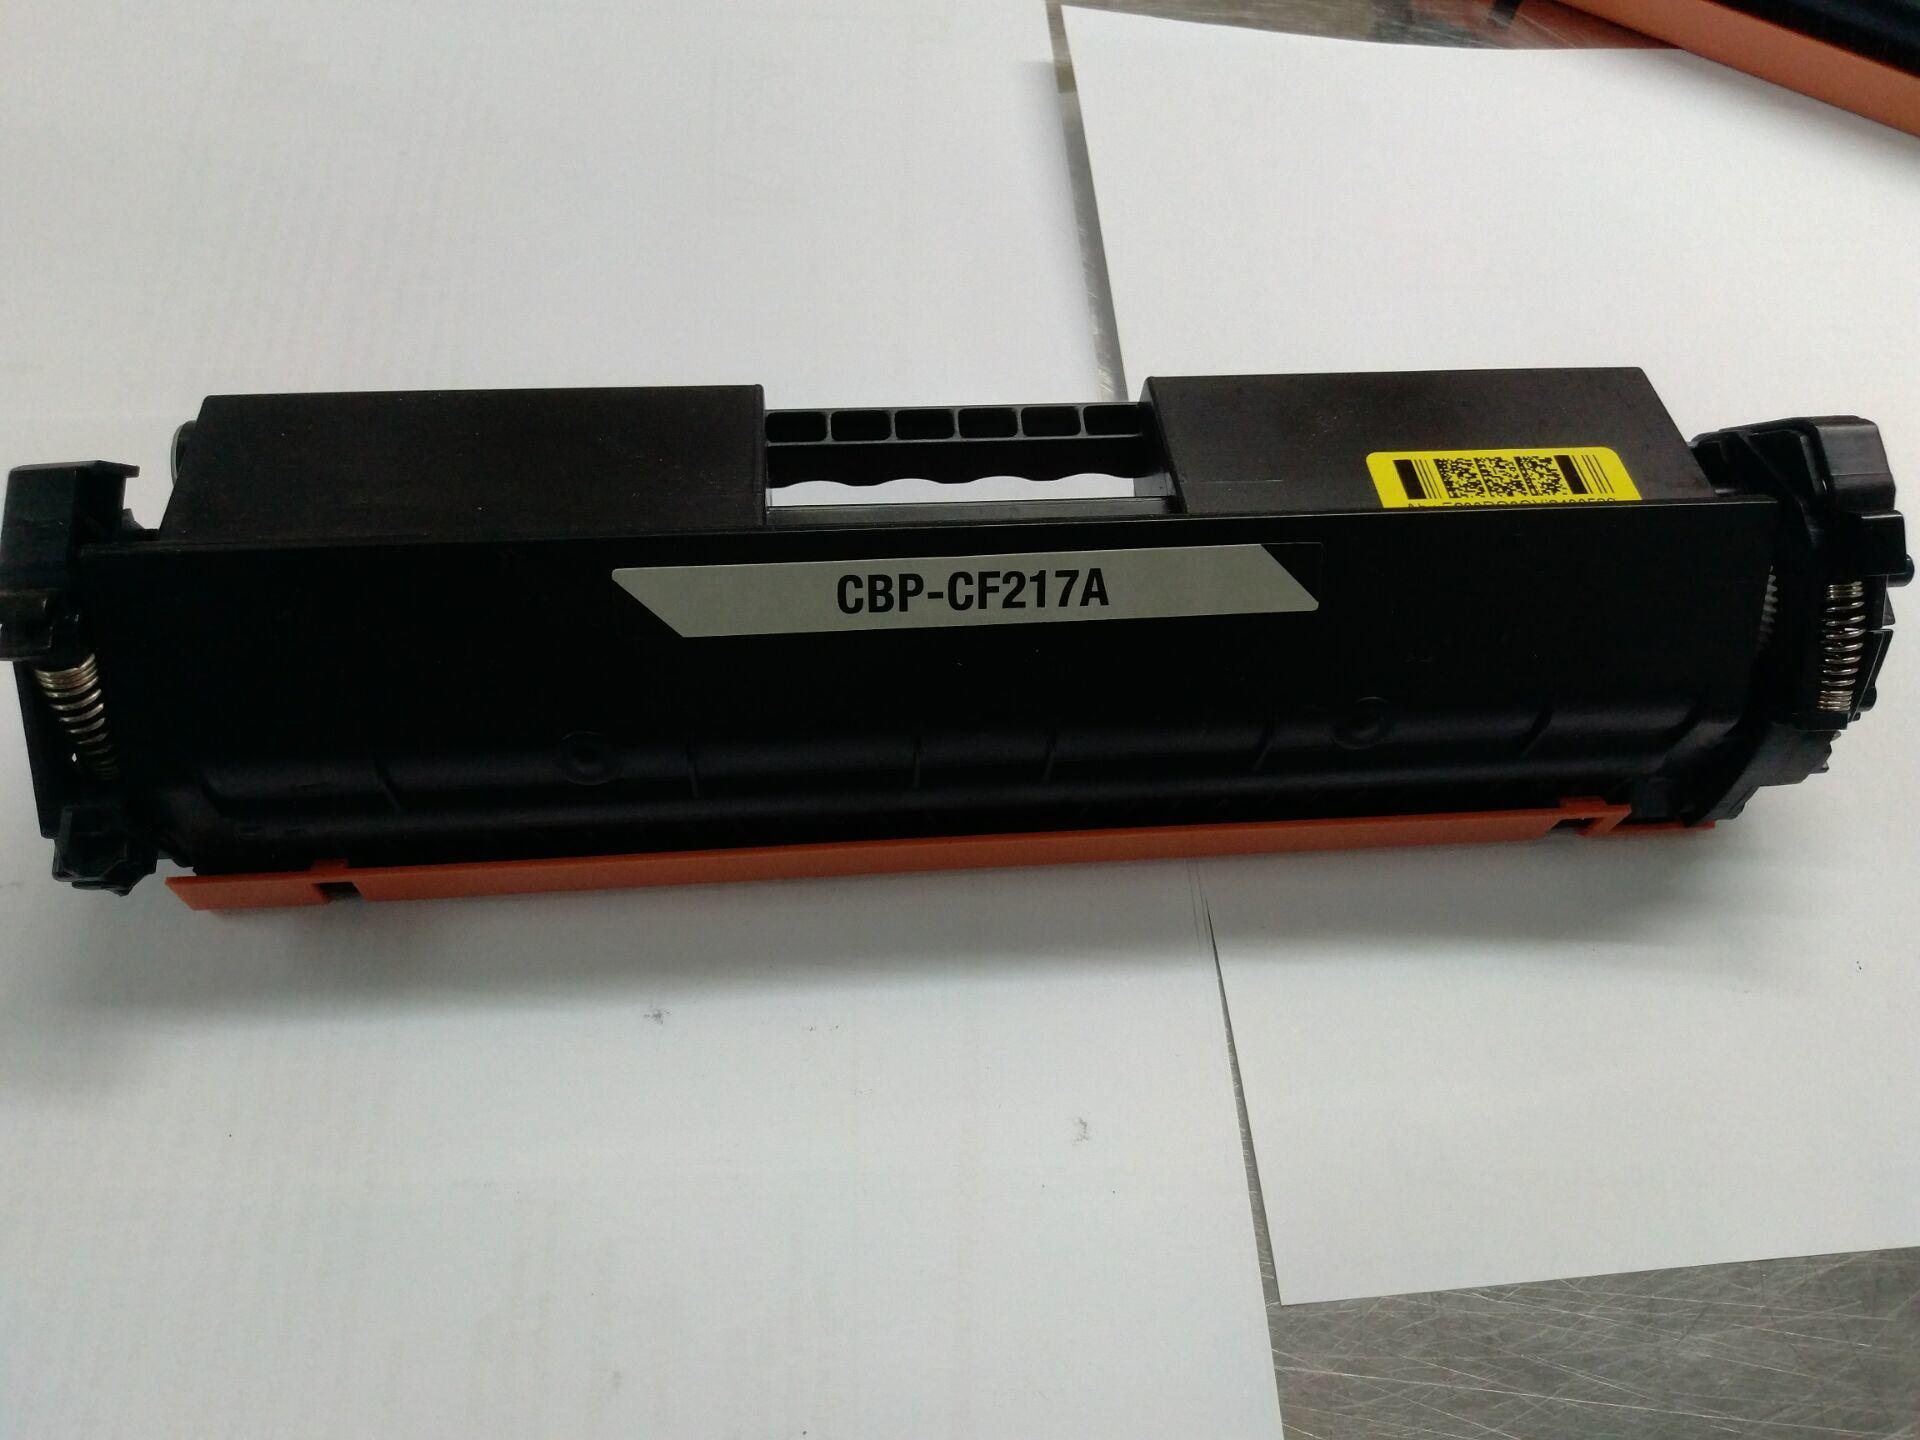 Compatible Toner Cartridge CF217A Toner for HP Laserjet PRO Mfp M130fn, M102W, M130fw Printer